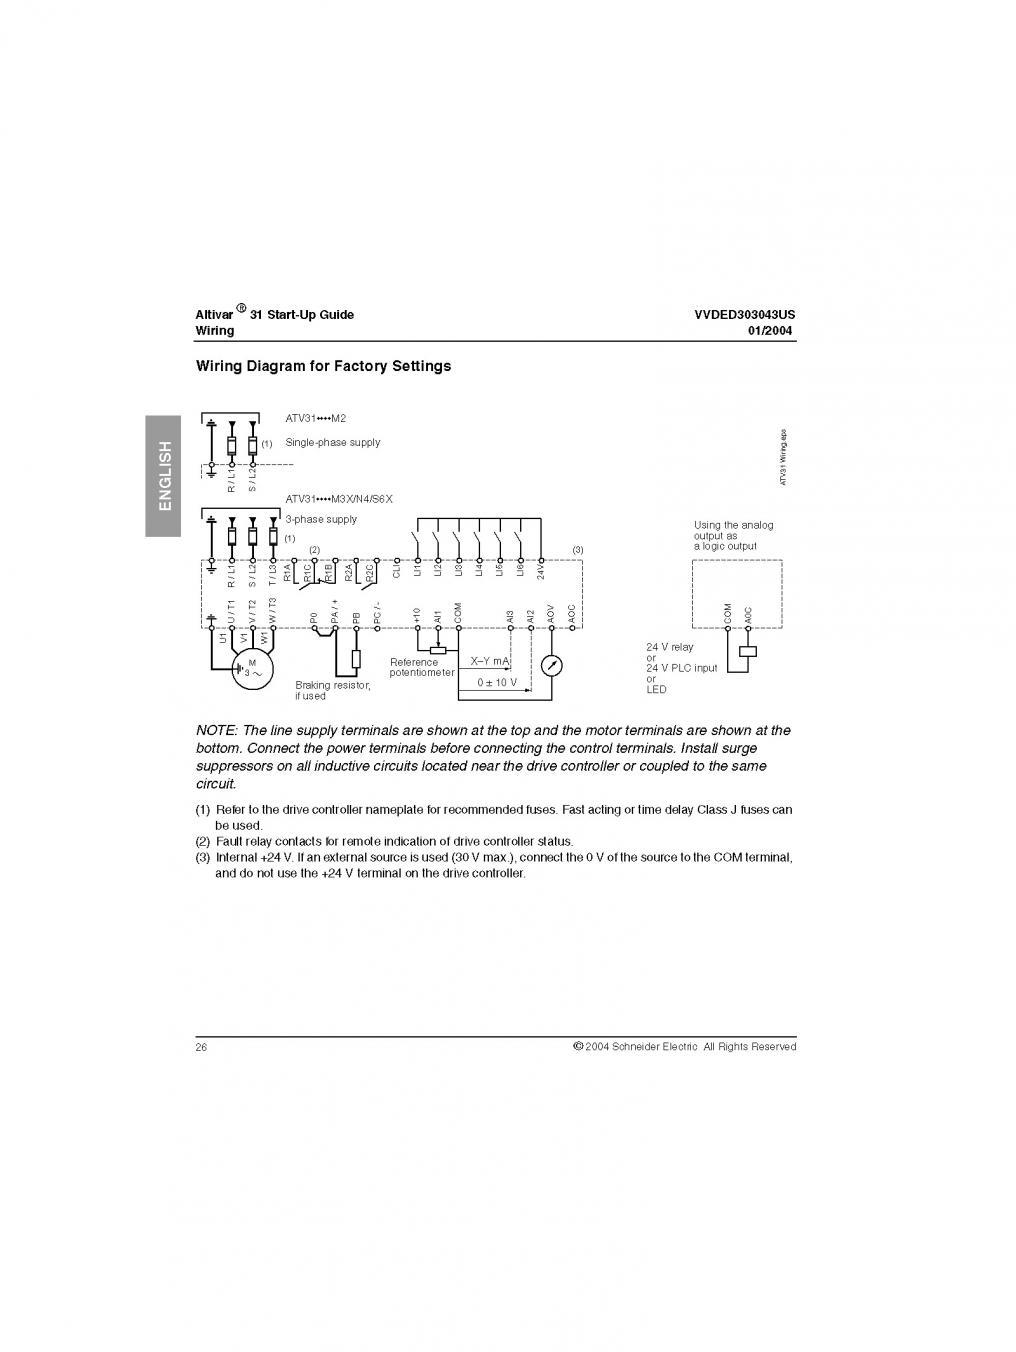 Altivar 61 Control Wiring Diagram Auto Electrical 31